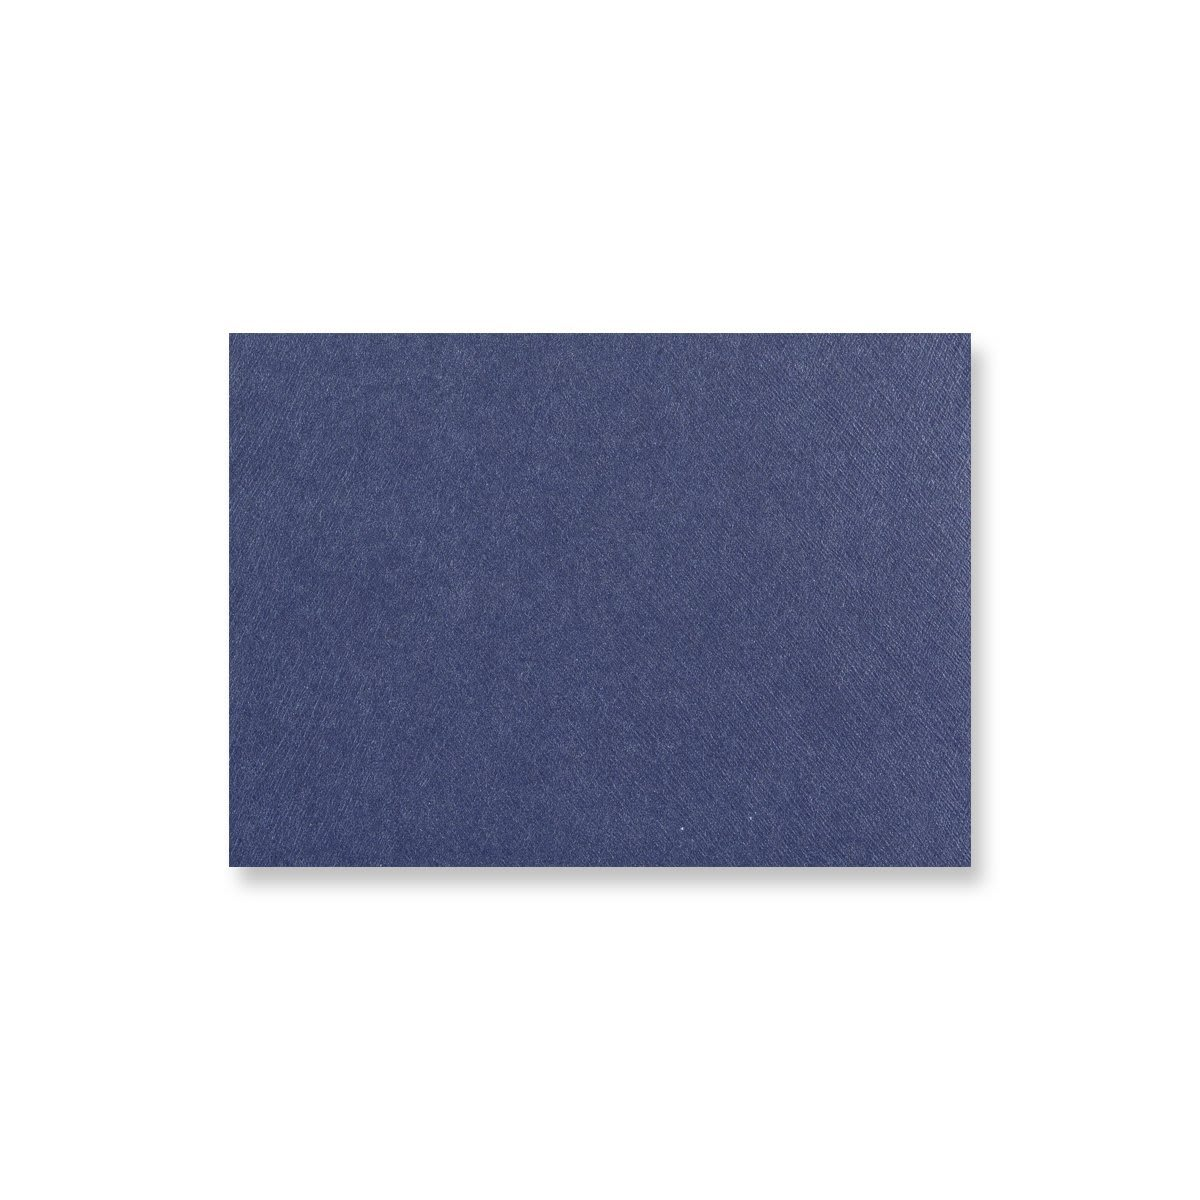 C7 MIDNIGHT BLUE BUTTERFLY ENVELOPES